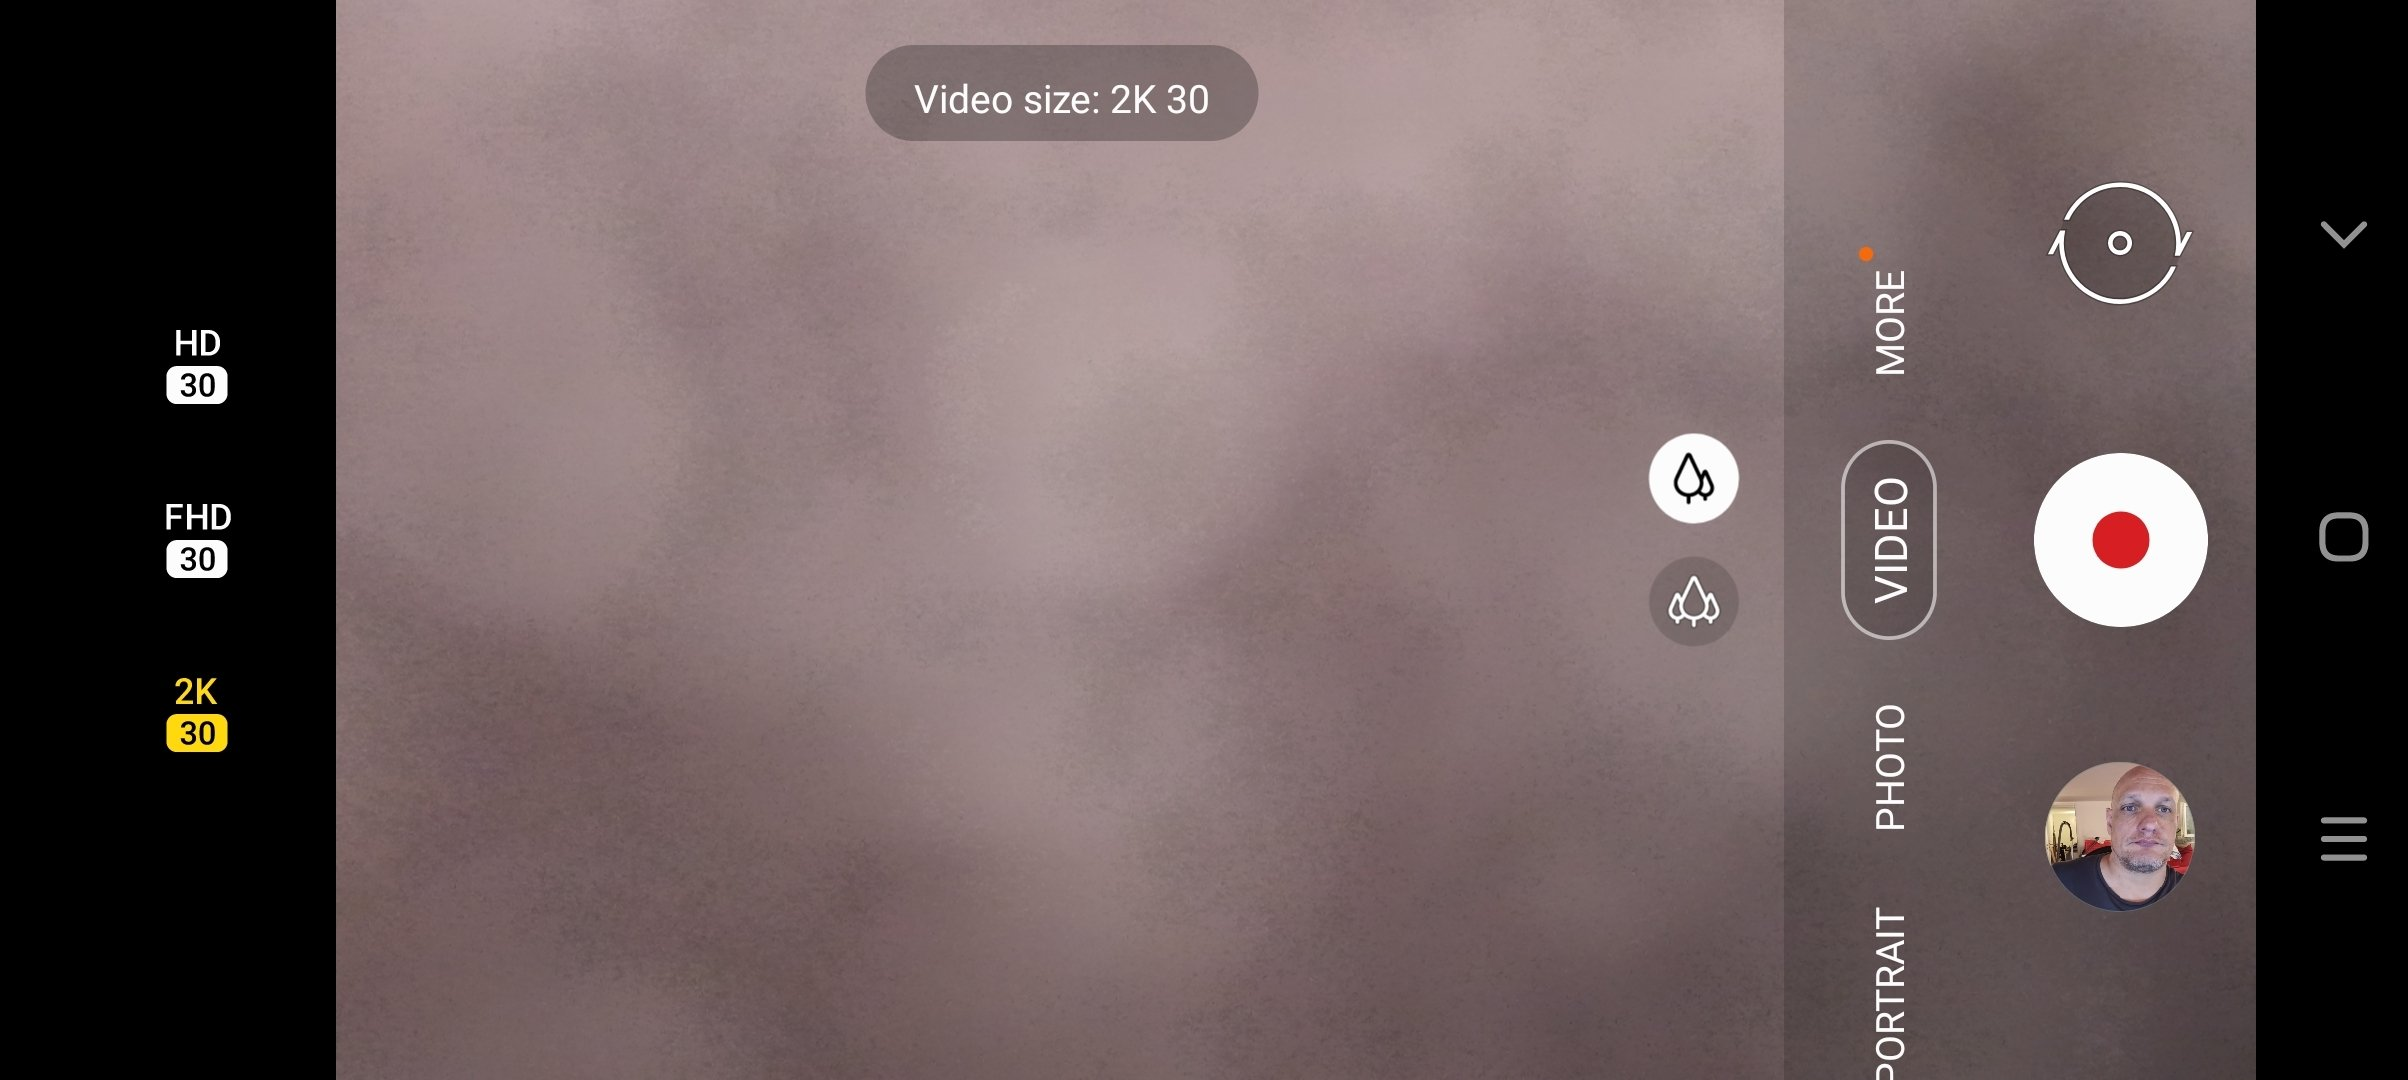 Samsung Galaxy A22 5G Video Recording Resolution